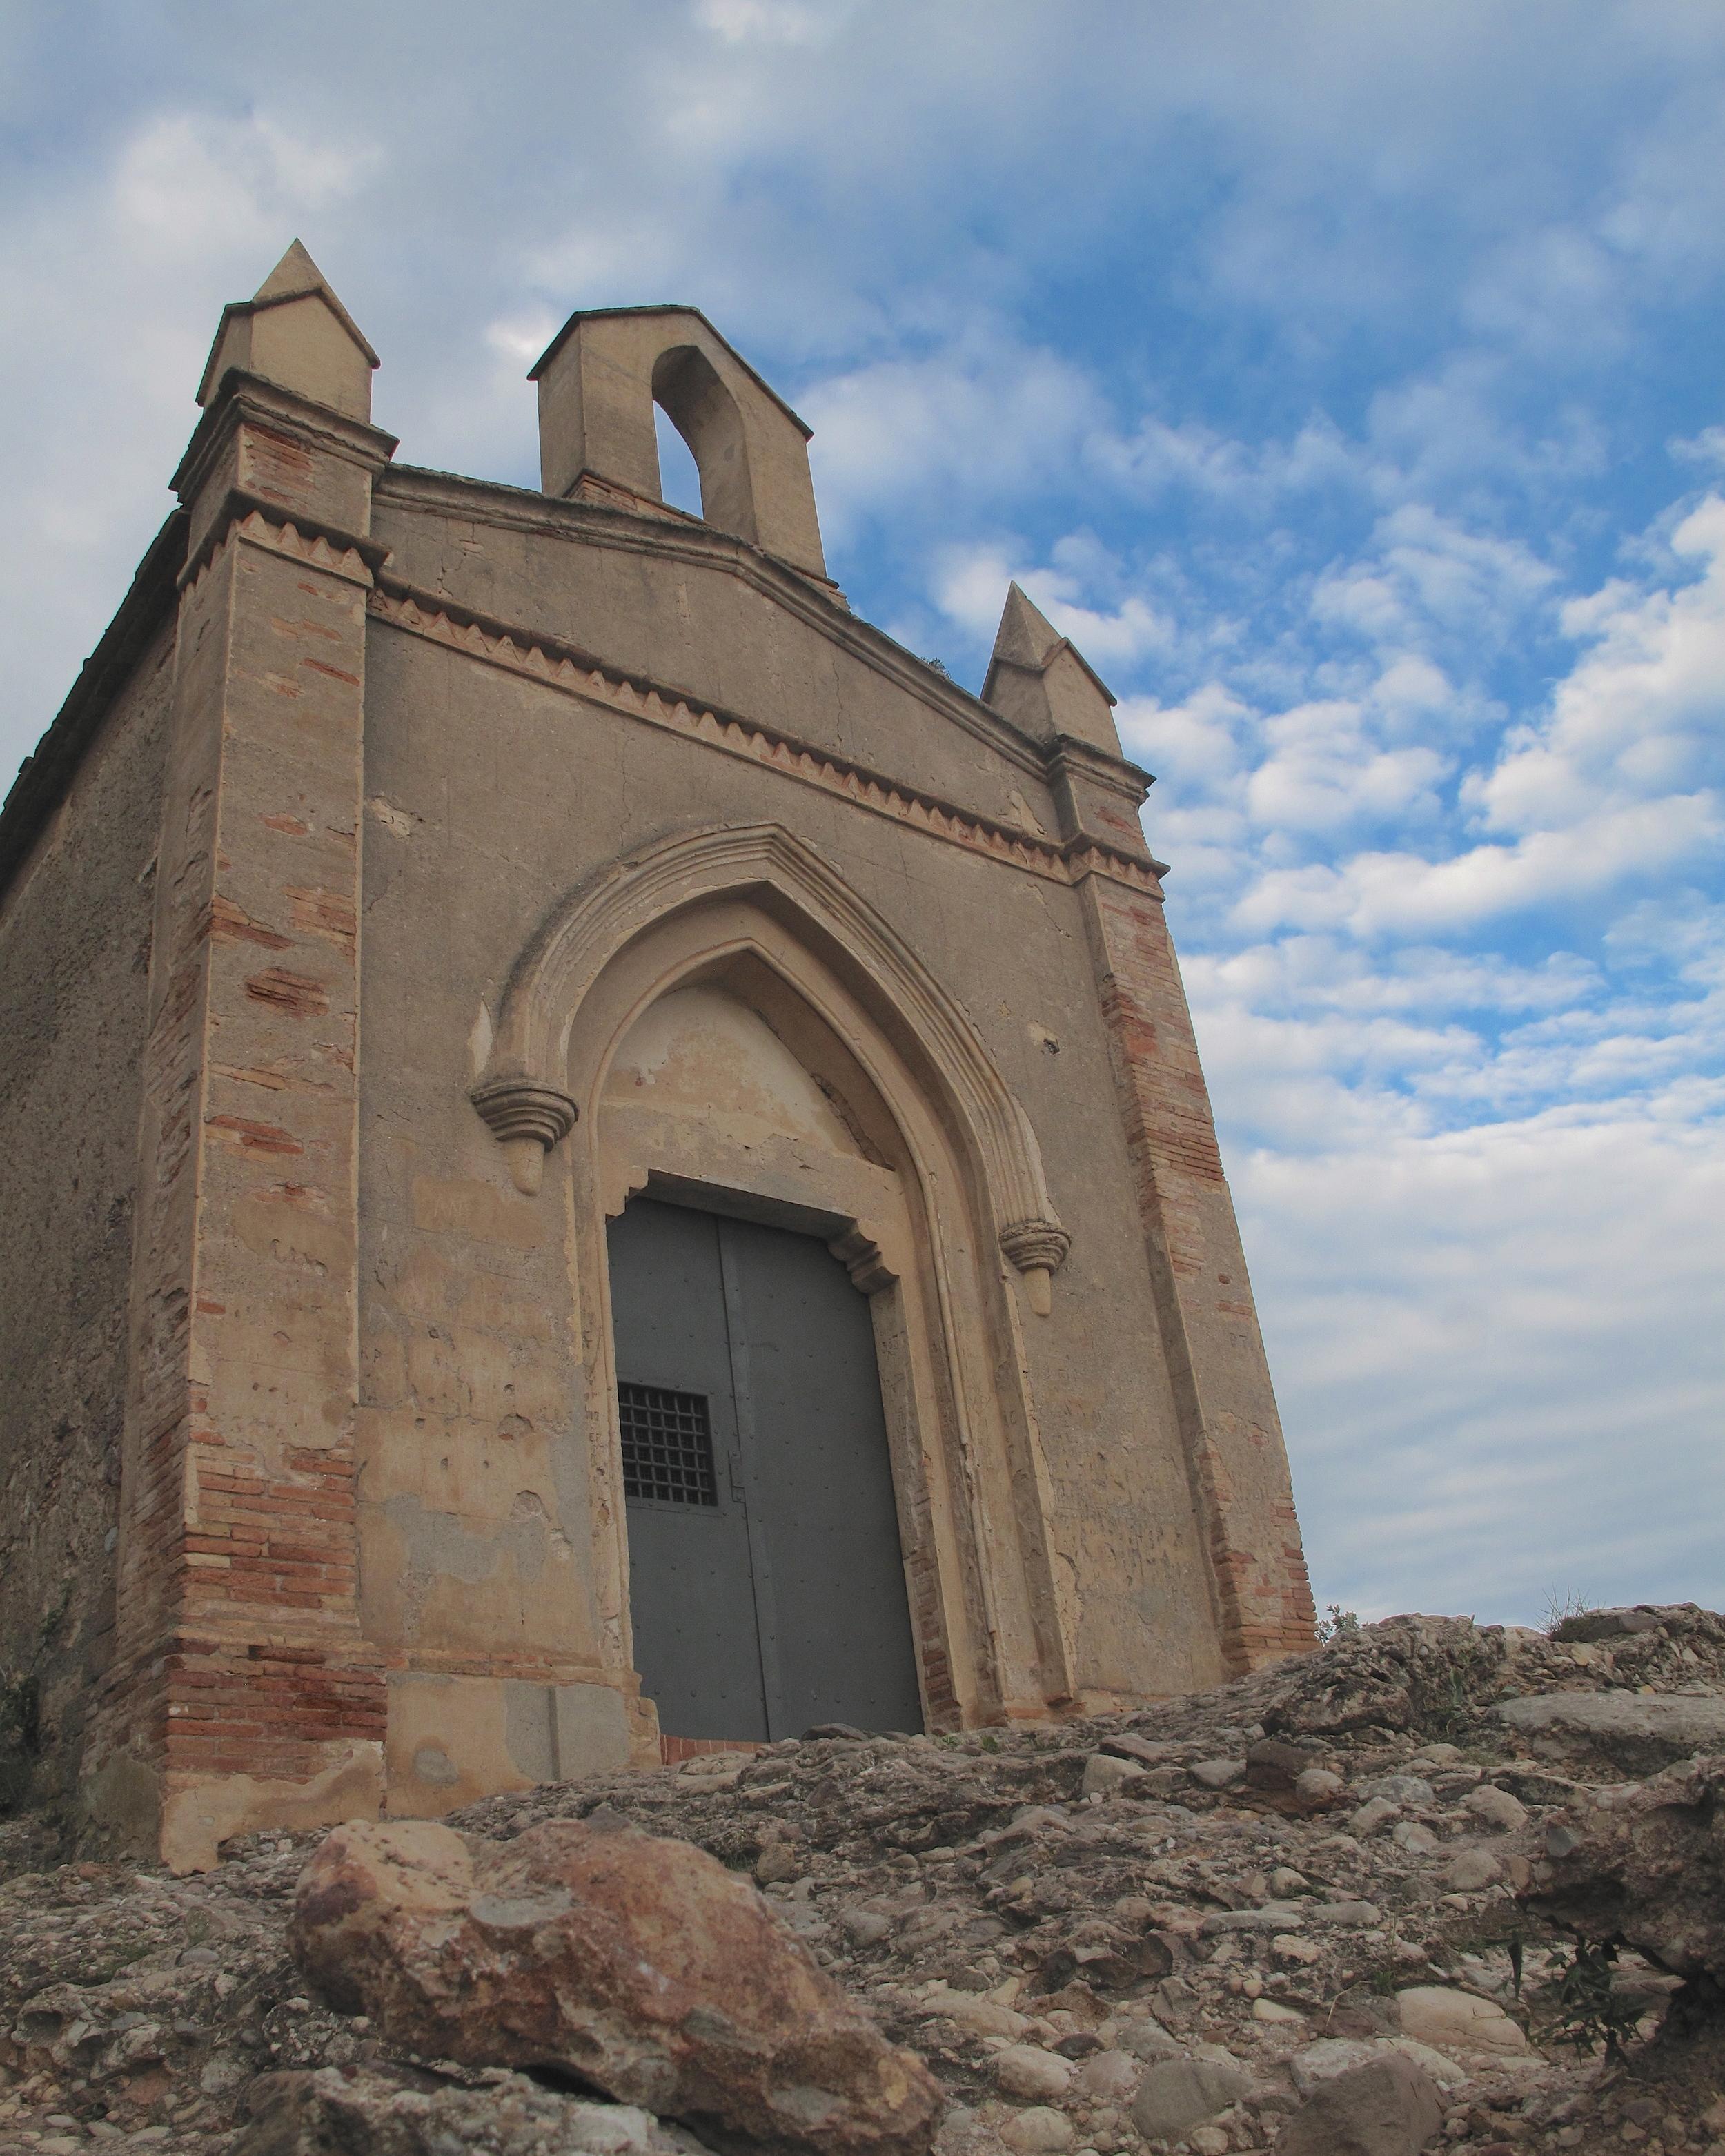 St Jerome chapel on Montserrat mountain.